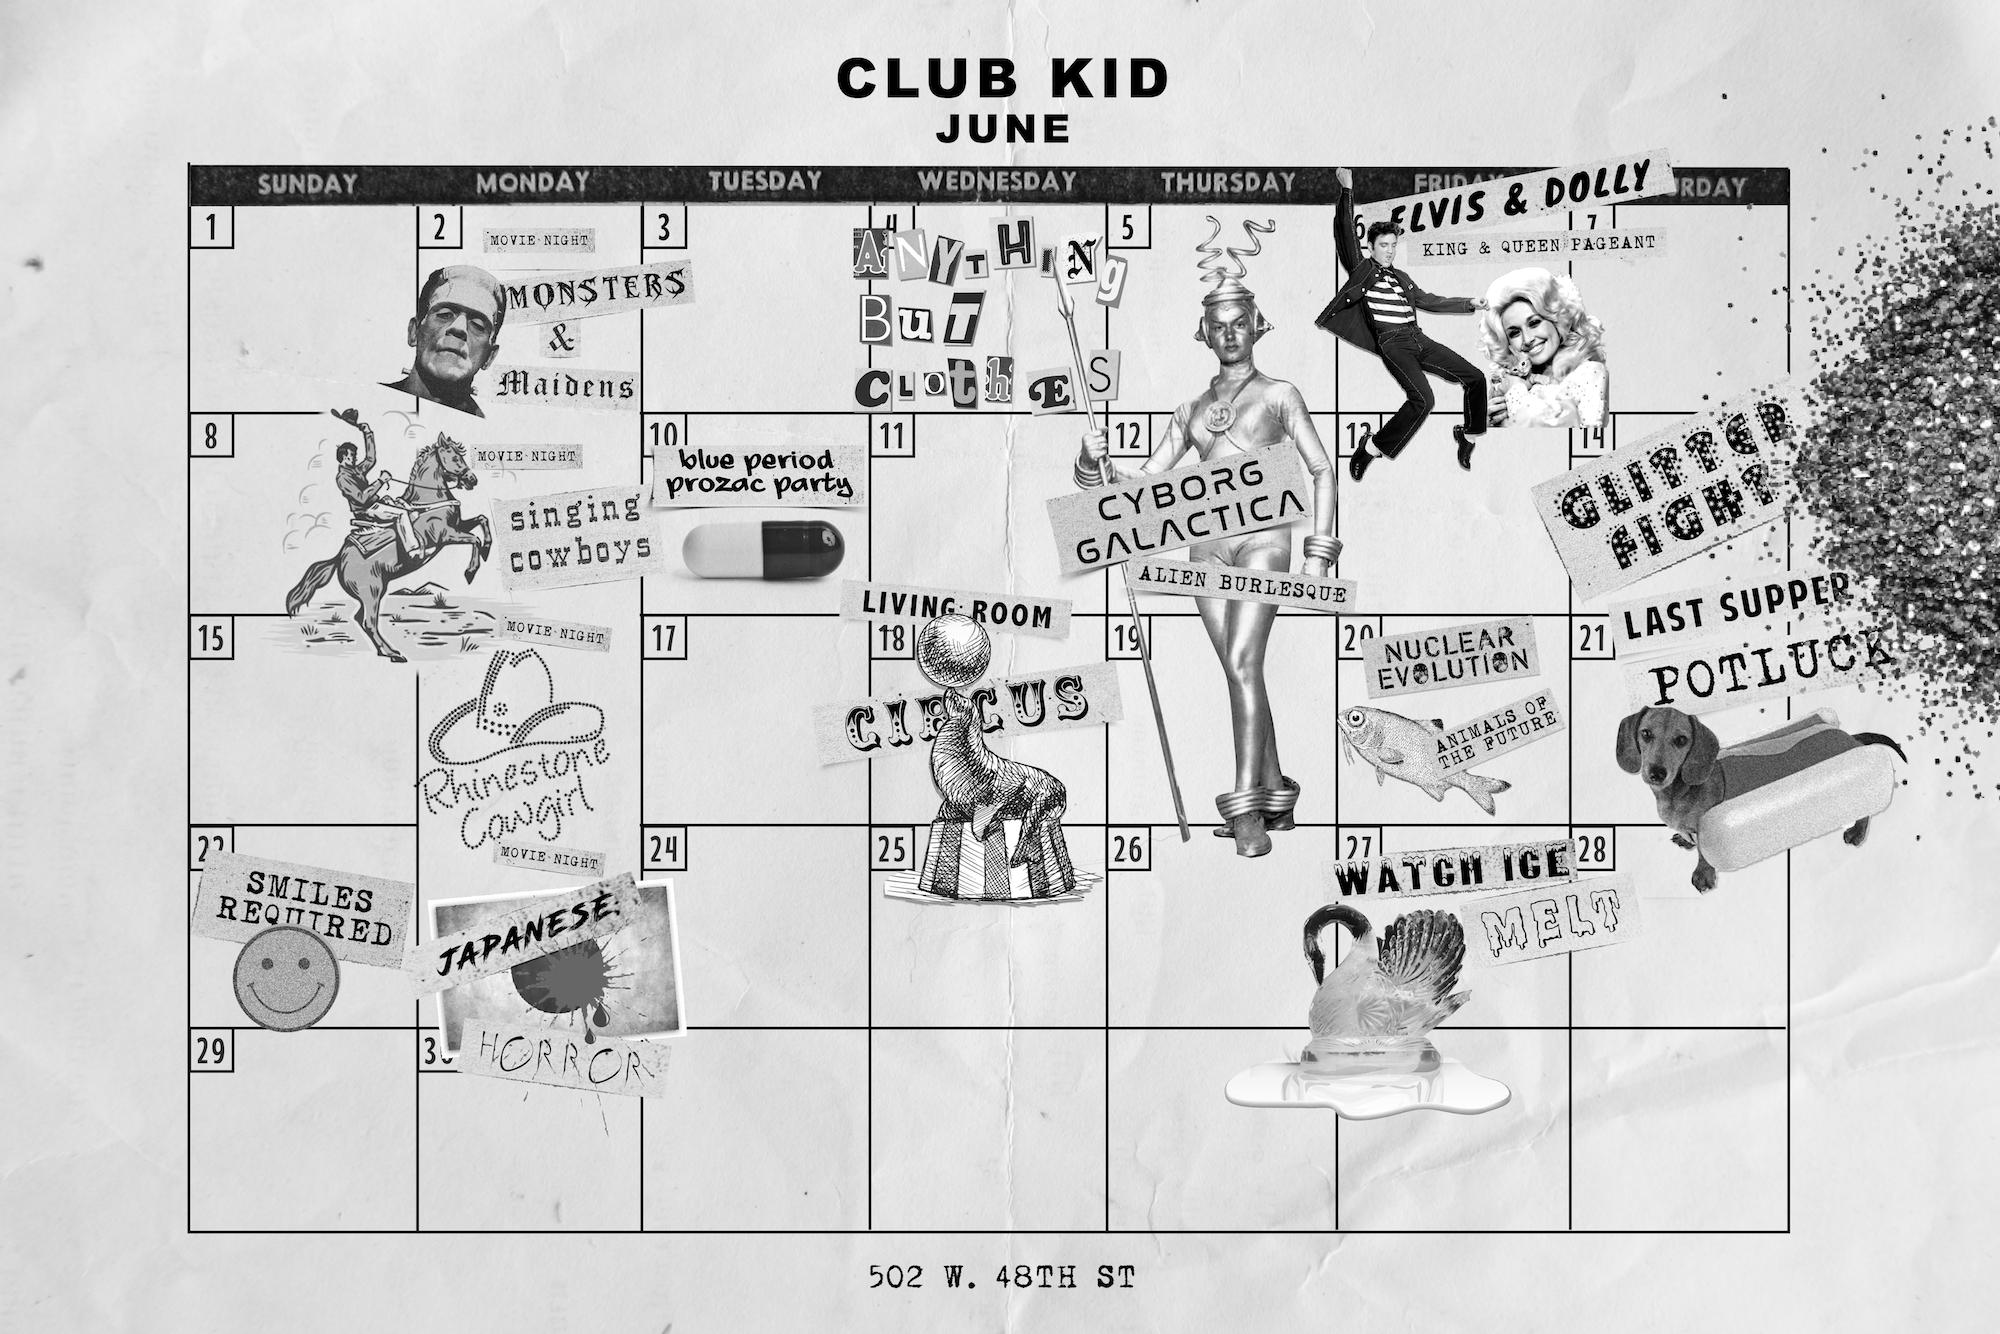 club kids calendar high res Side 1.png